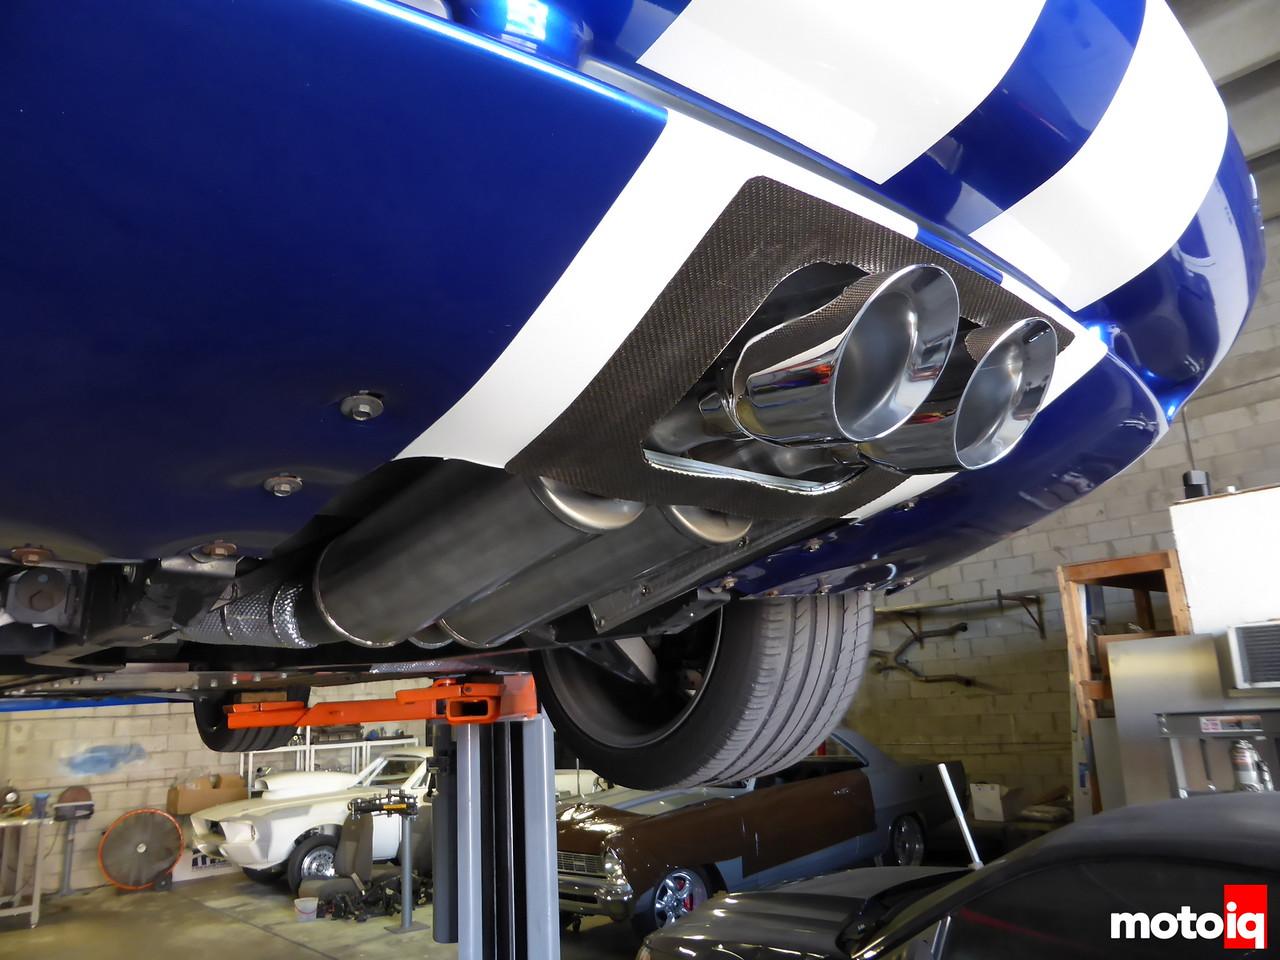 Viper GTS Corsa Exhaust Tips